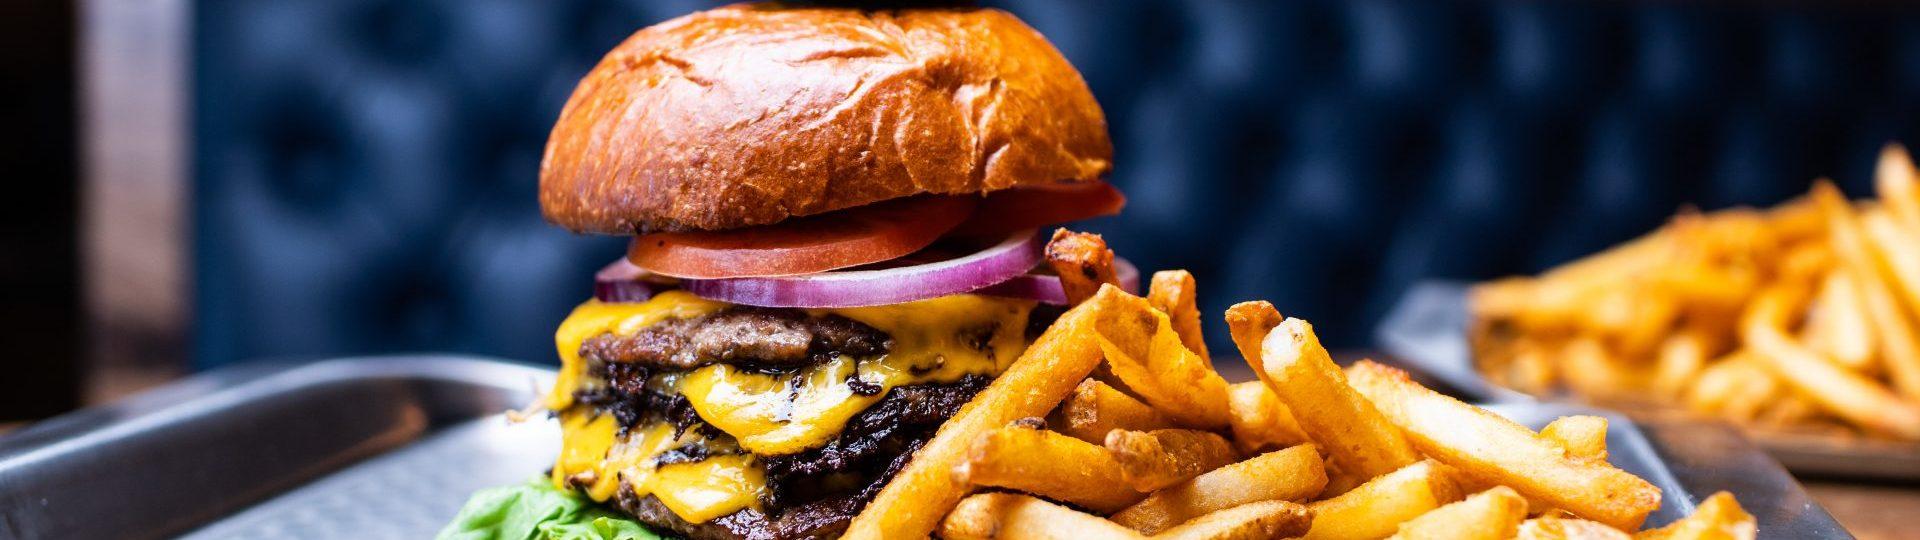 Tall hamburger with fries.